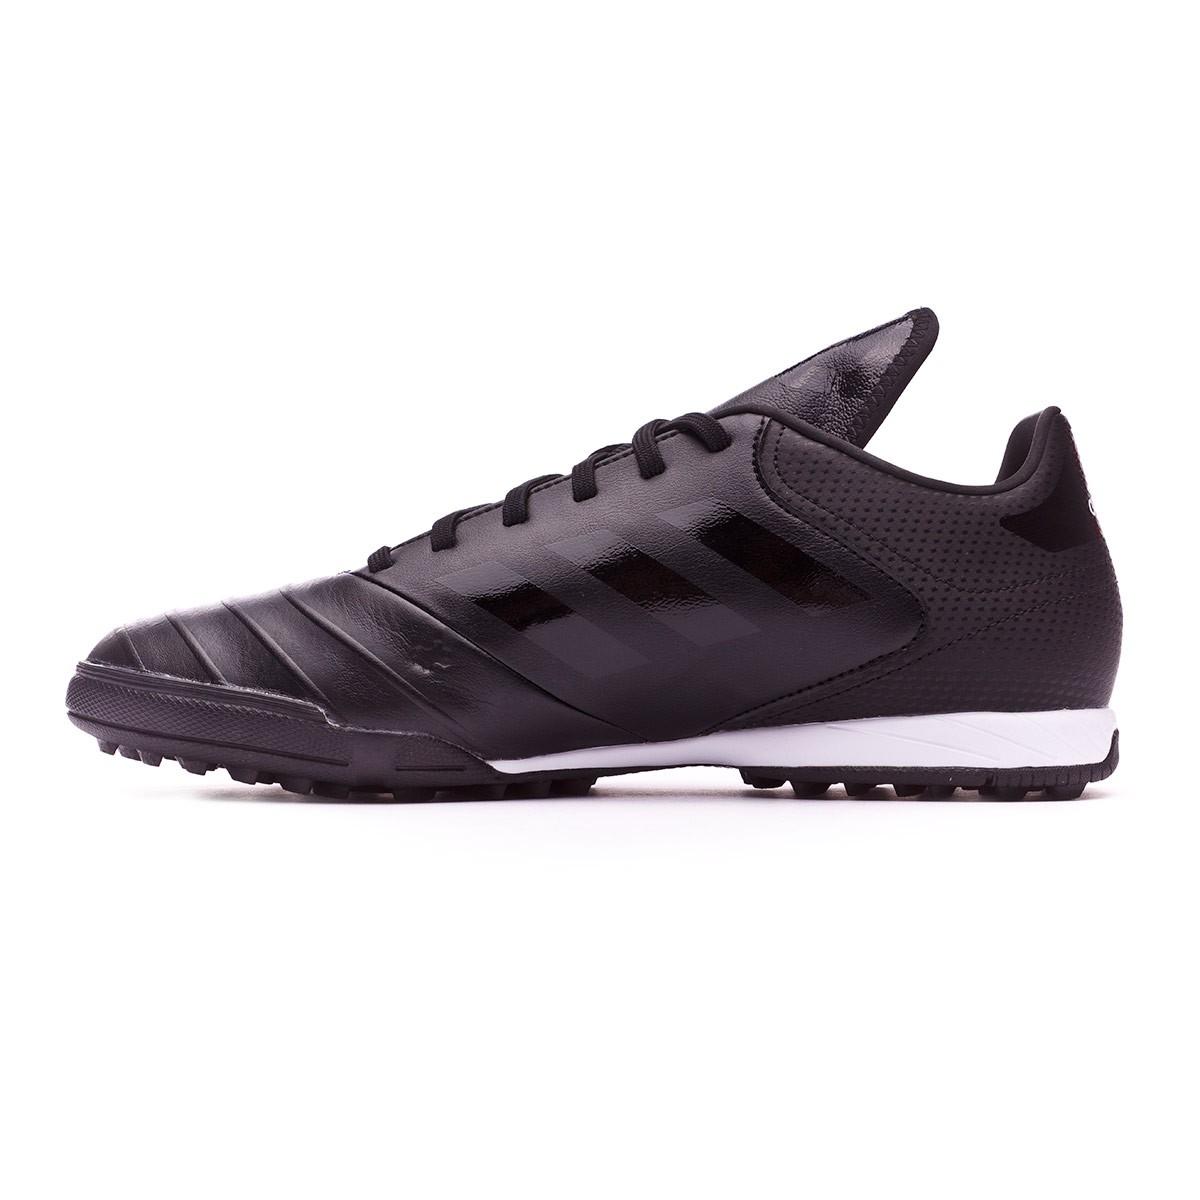 81b6c751d8c Football Boot adidas Copa Tango 18.3 Turf Core black-White - Tienda de fútbol  Fútbol Emotion